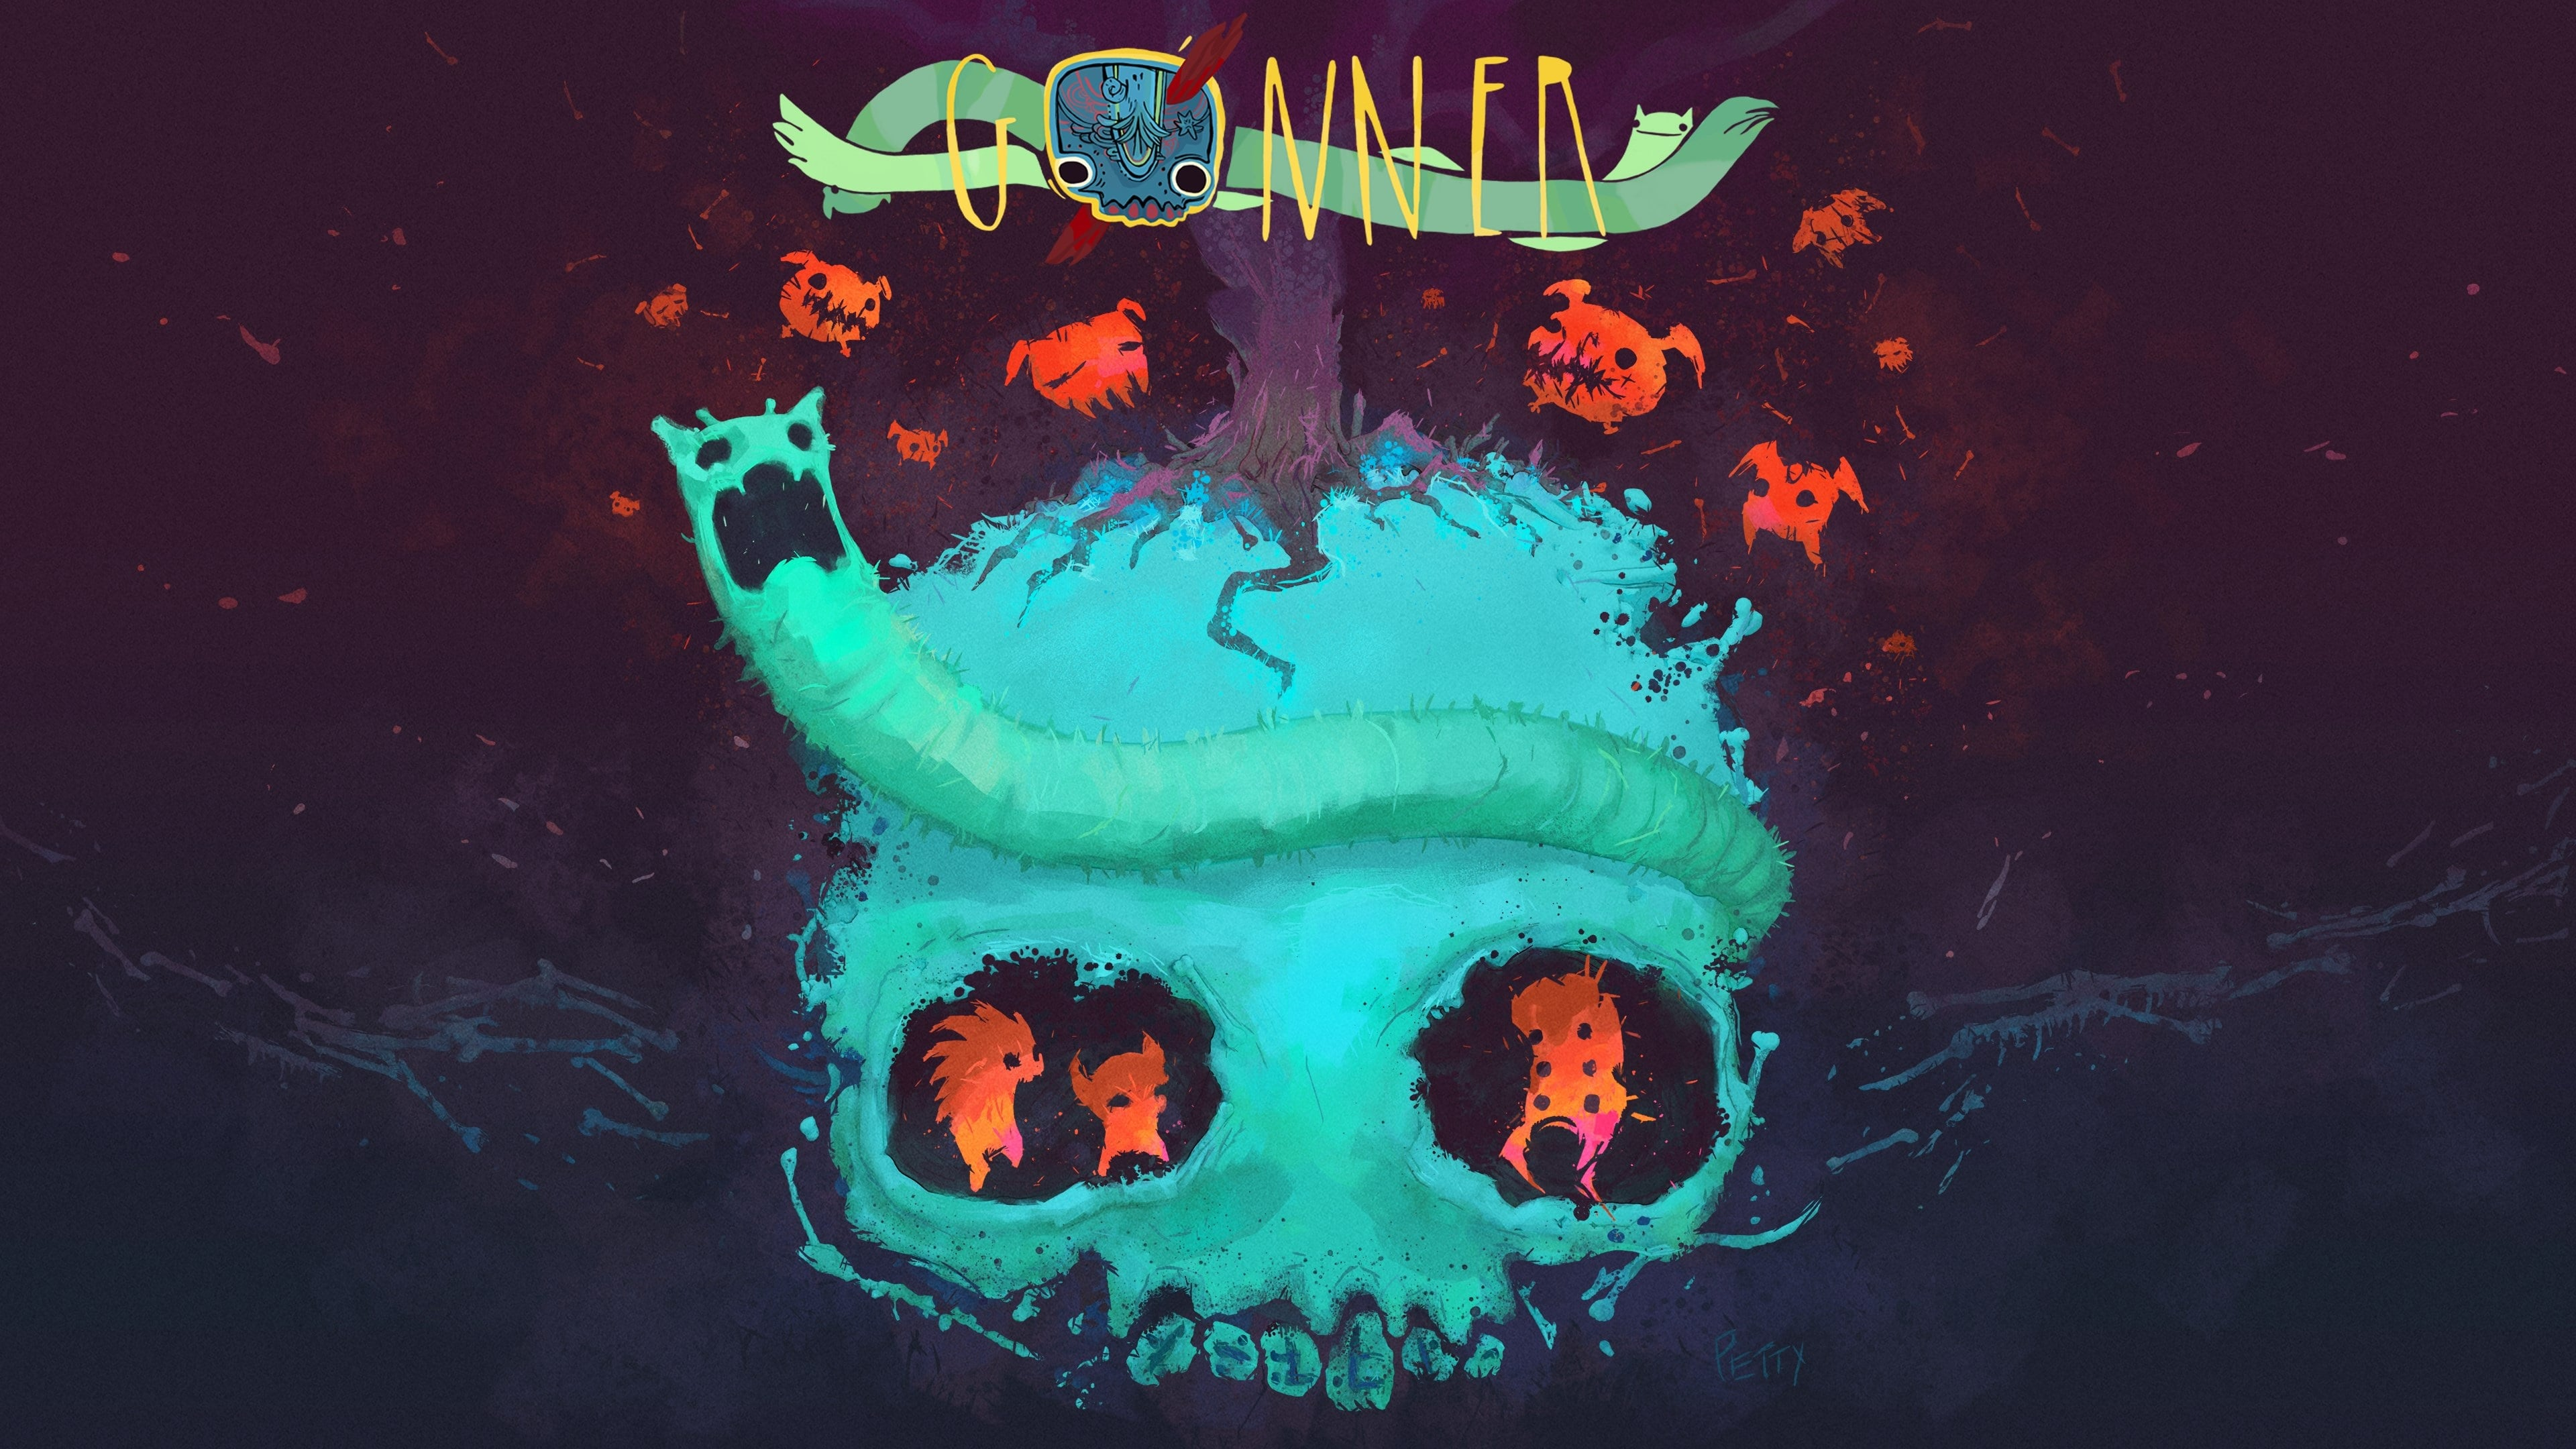 GoNNER (Win 10) Achievements